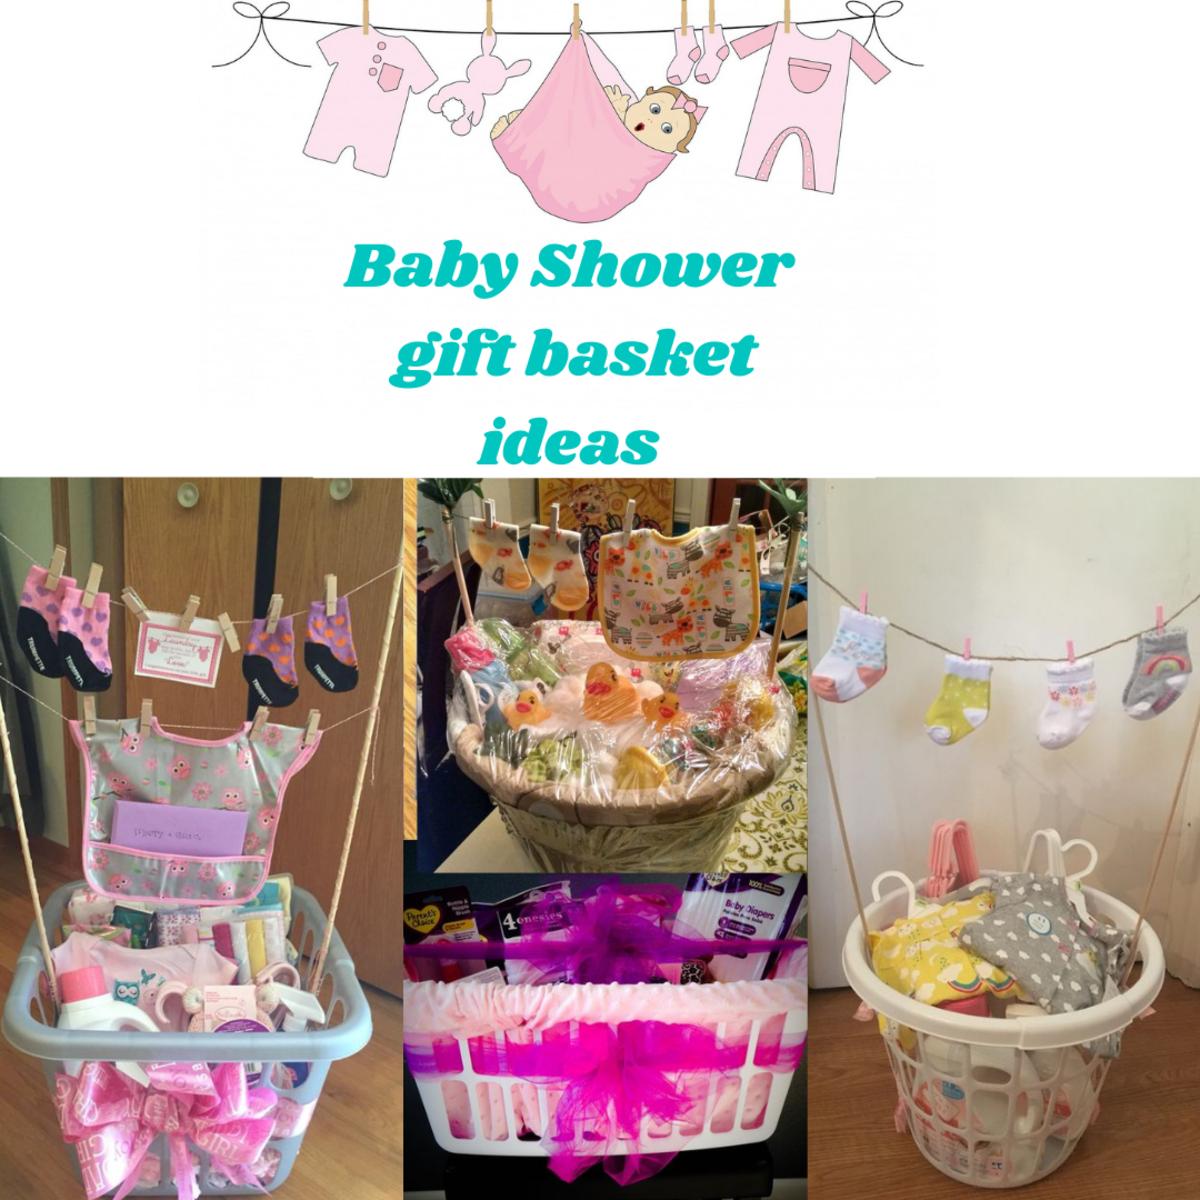 Baby Shower Laundry Basket Gift Ideas